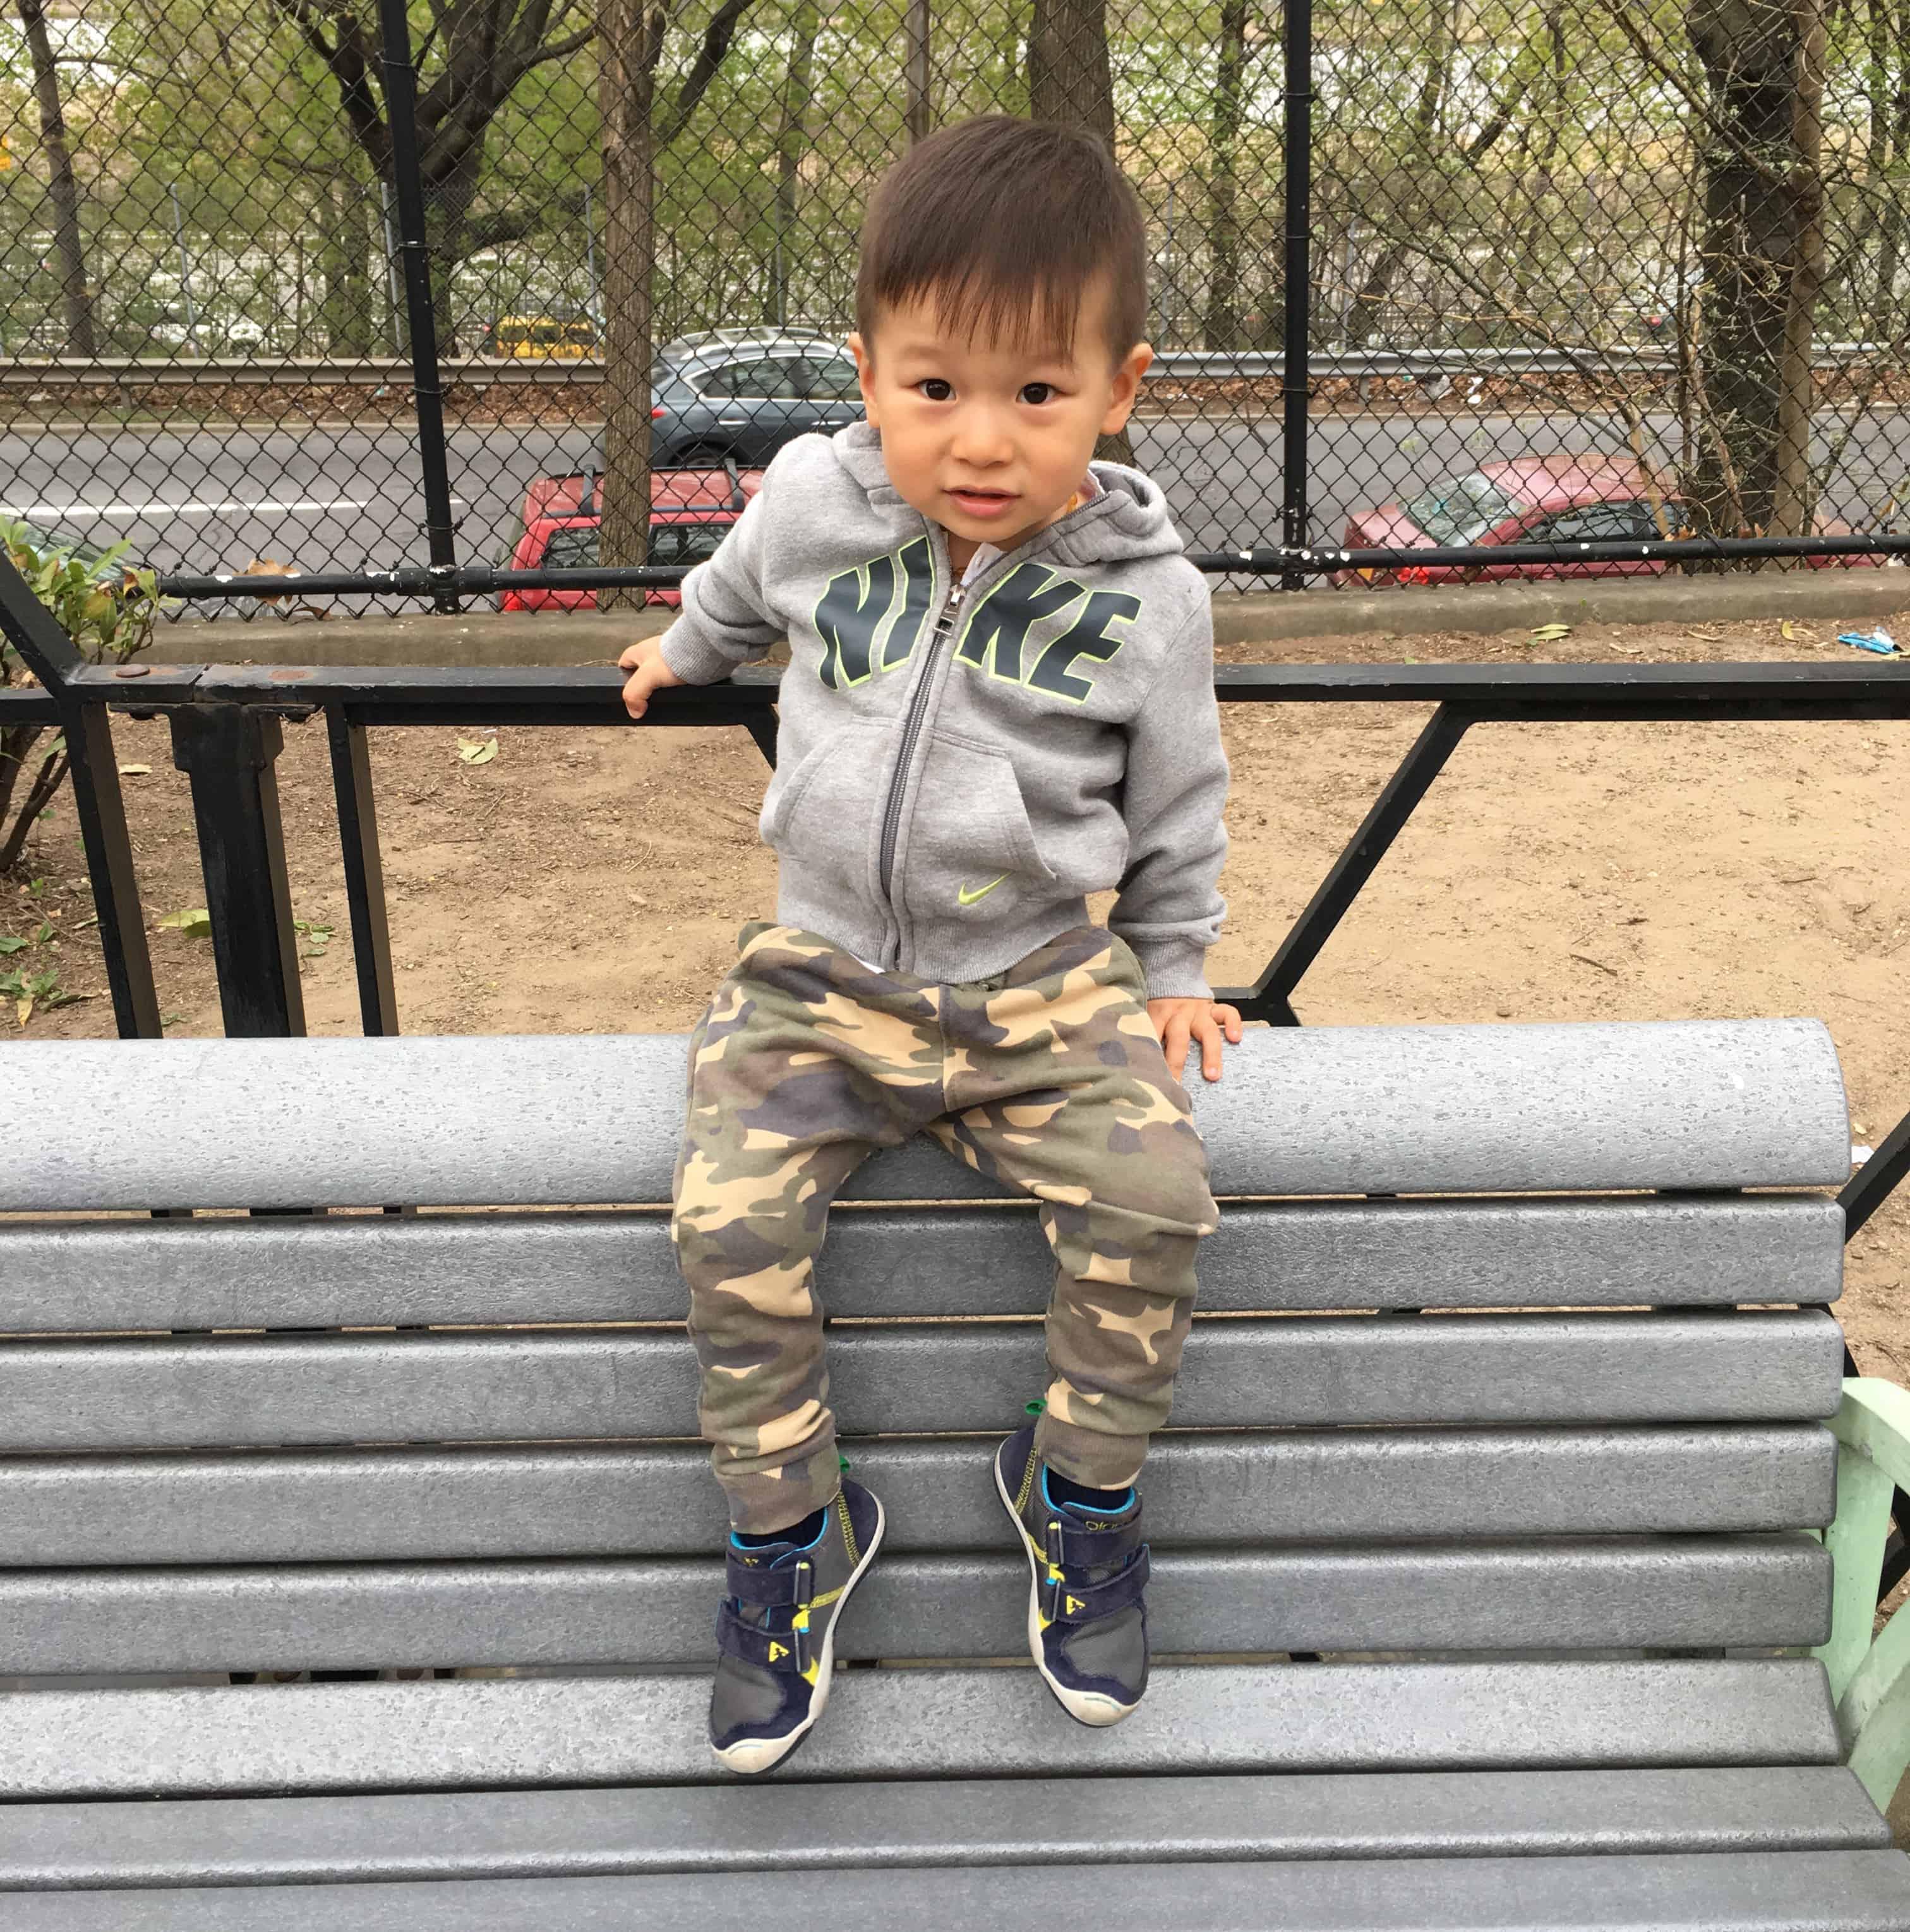 efad7b43a Best Toddler   Preschooler Shoes  PLAE Shoes Review